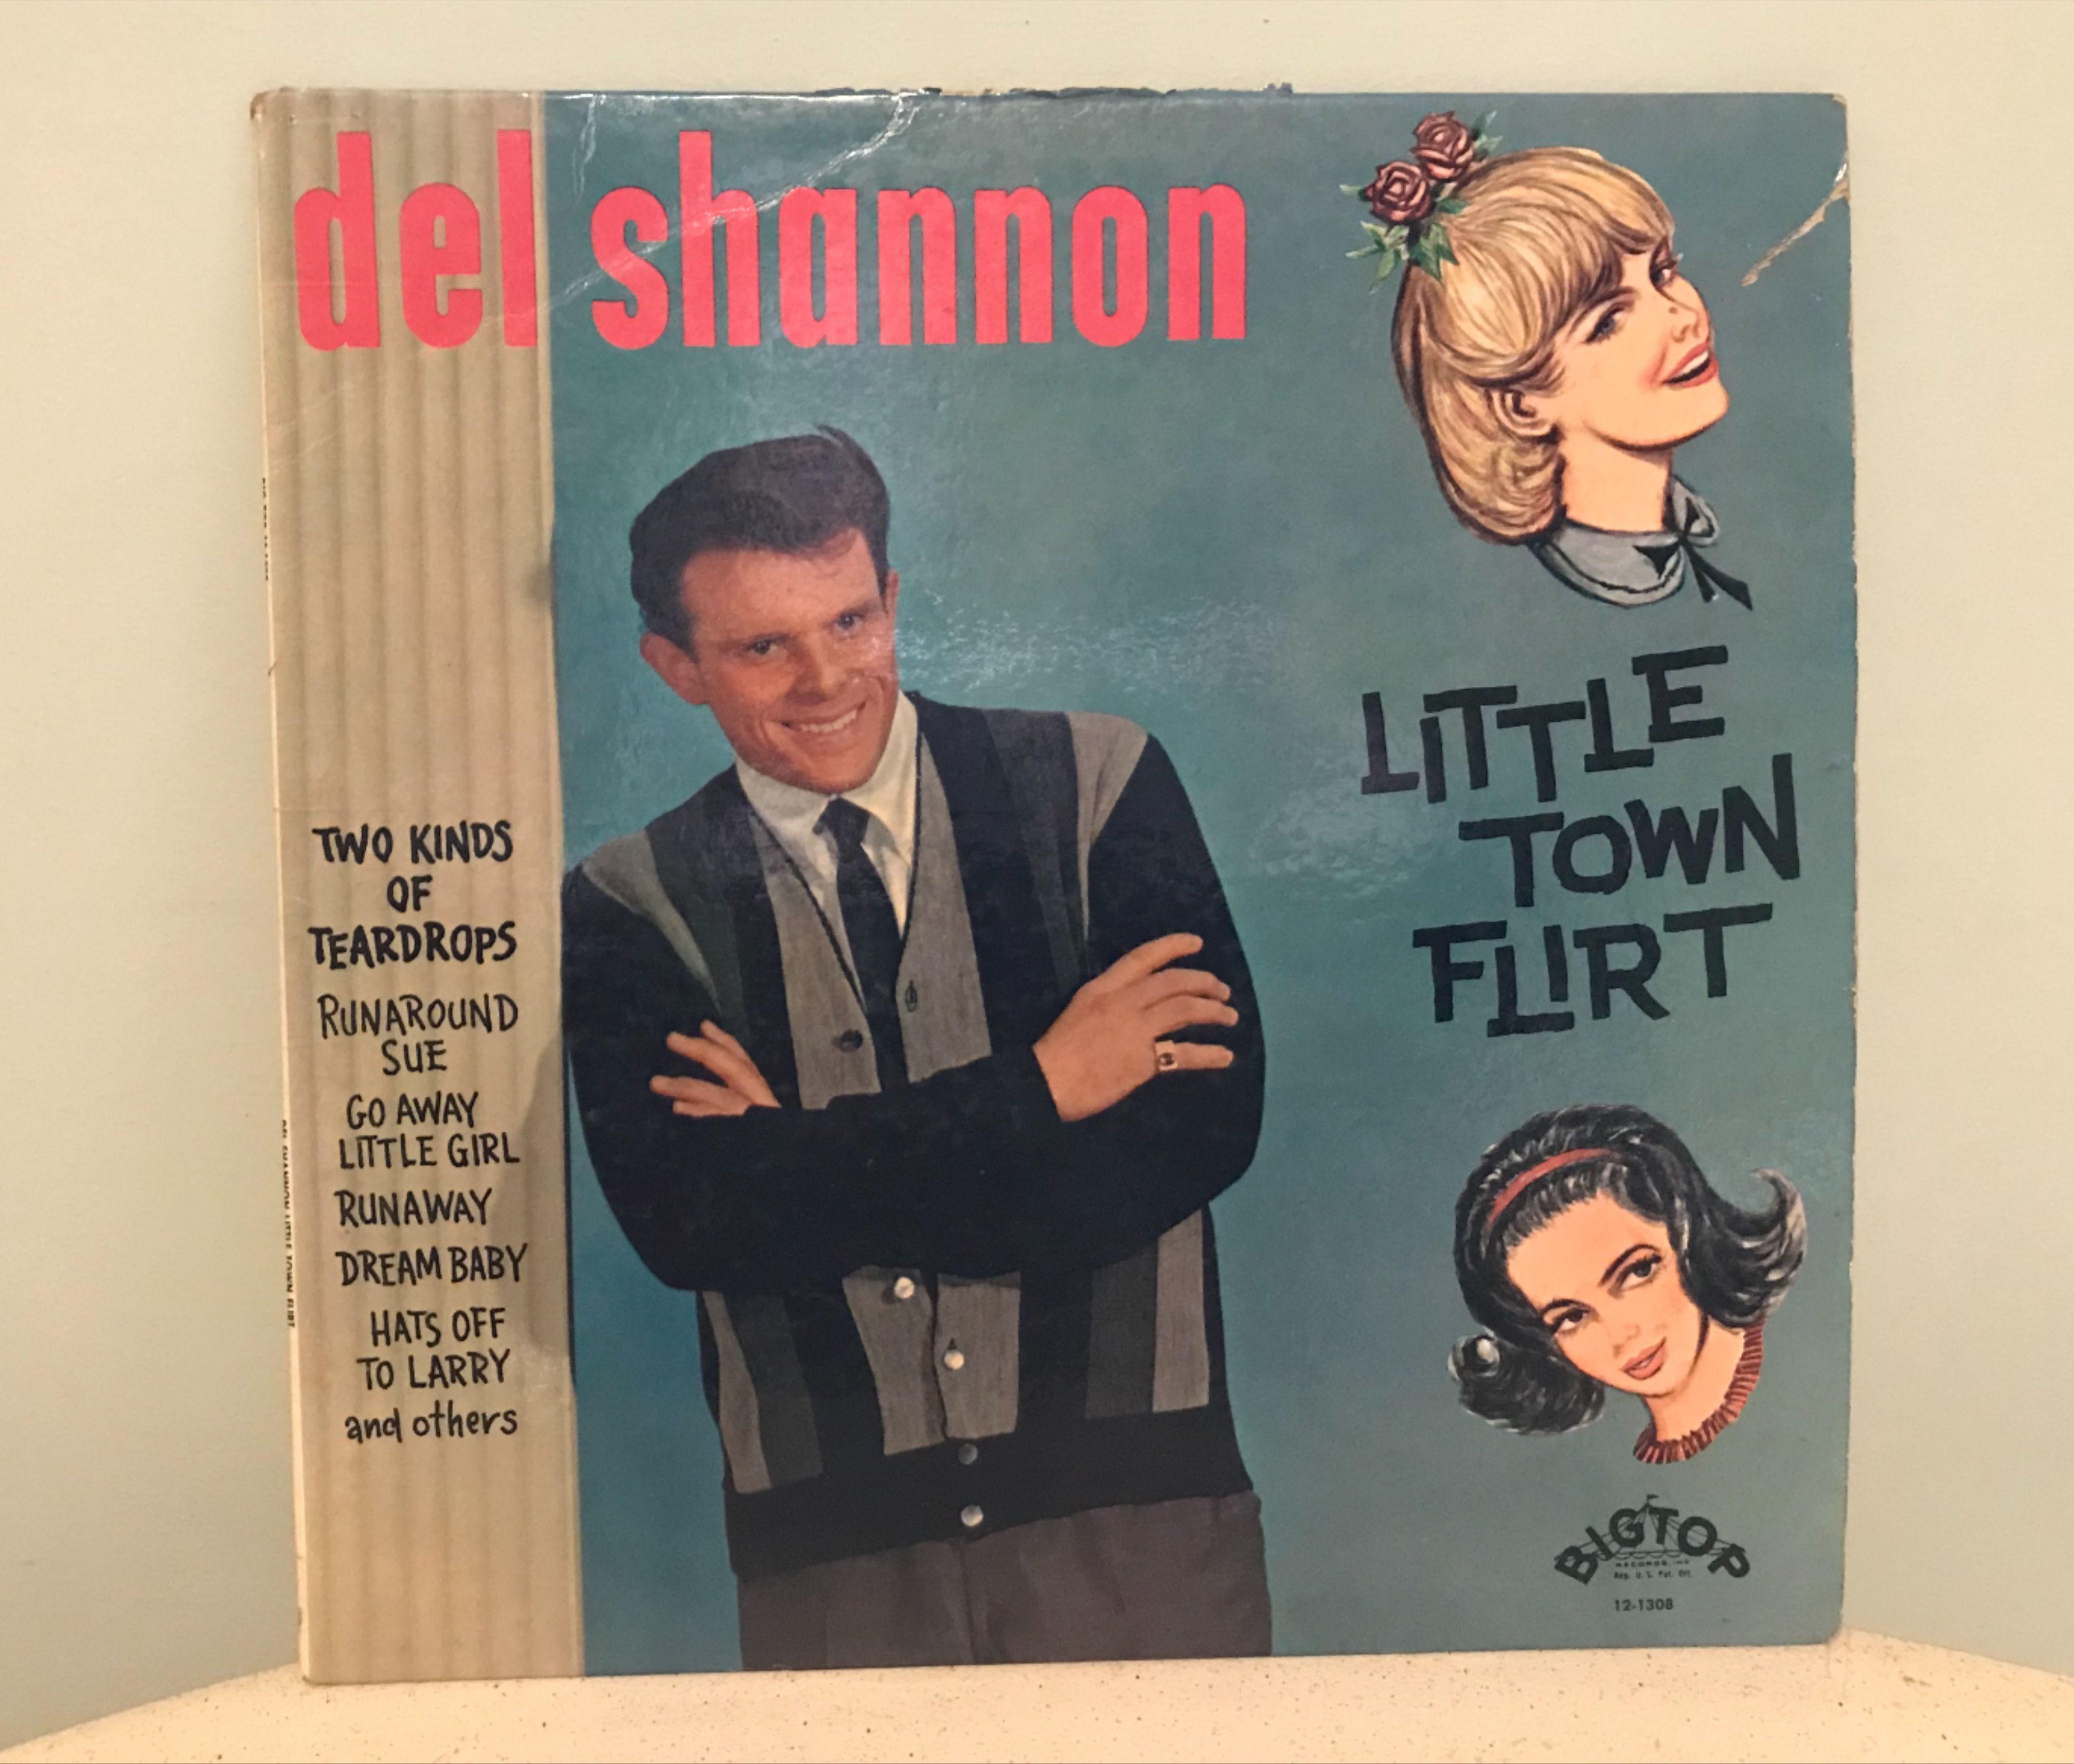 Del Shannon Album Little Town Flirt Vintage Run Around Sue Hey Little Girl Runaway Go Away Little Girl Rock N Roll 1963 Lp Big Top Record In 2020 Hey Little Girl